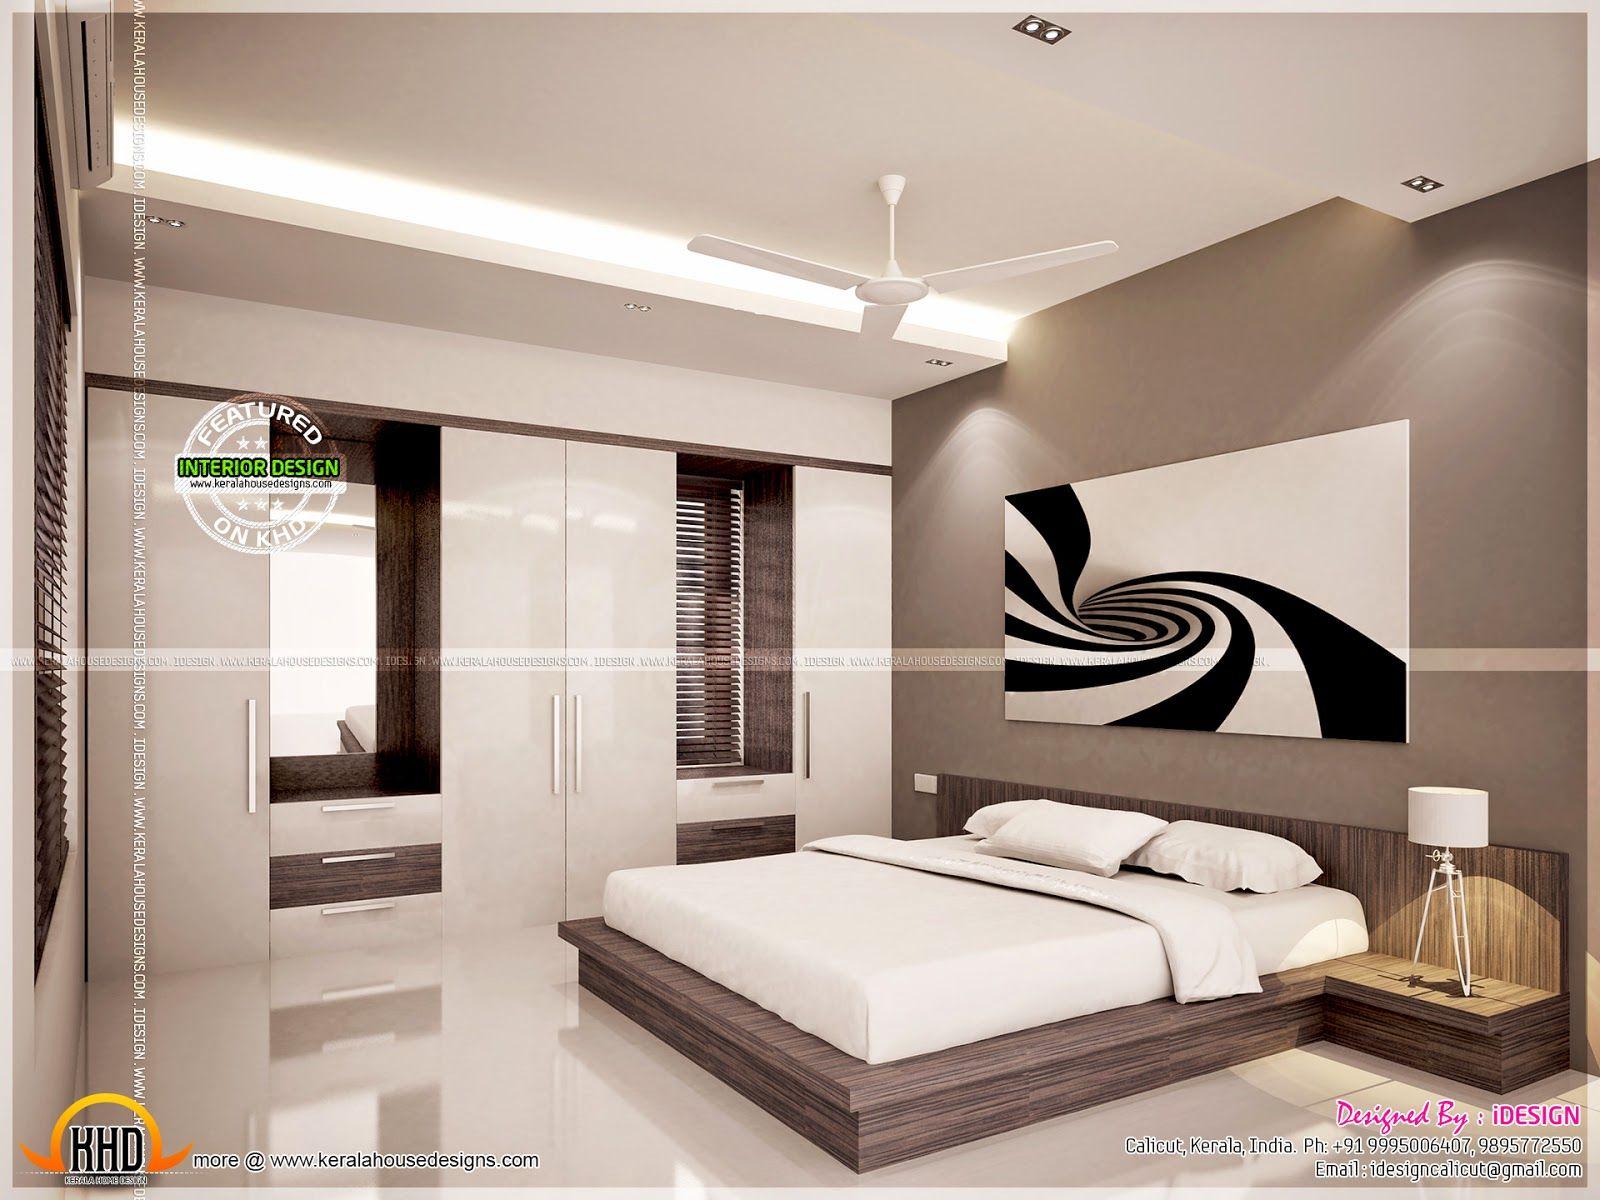 Kitchen Master Bedroom Living Interiors Interior Design Software Master Bedroom Design Kerala House Design Kerala style bedroom ideas